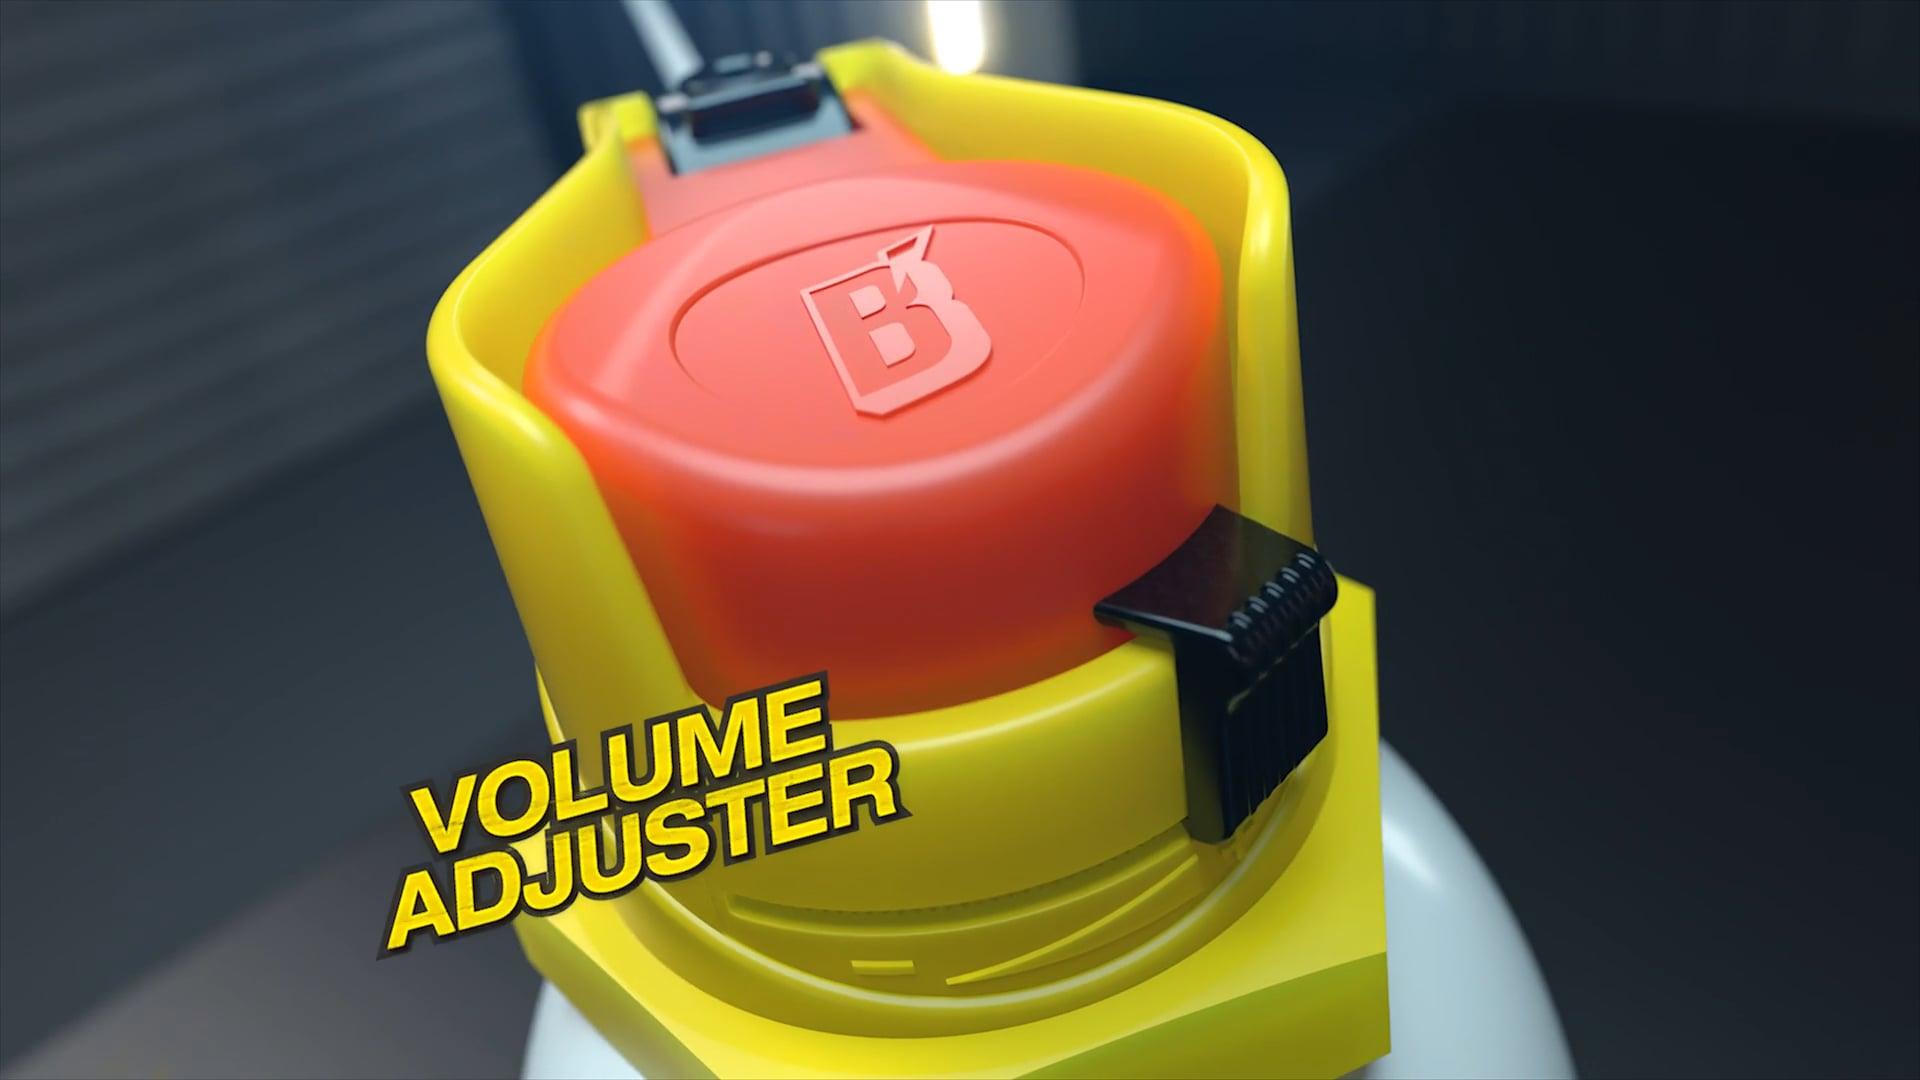 Blaster Straw Reveal